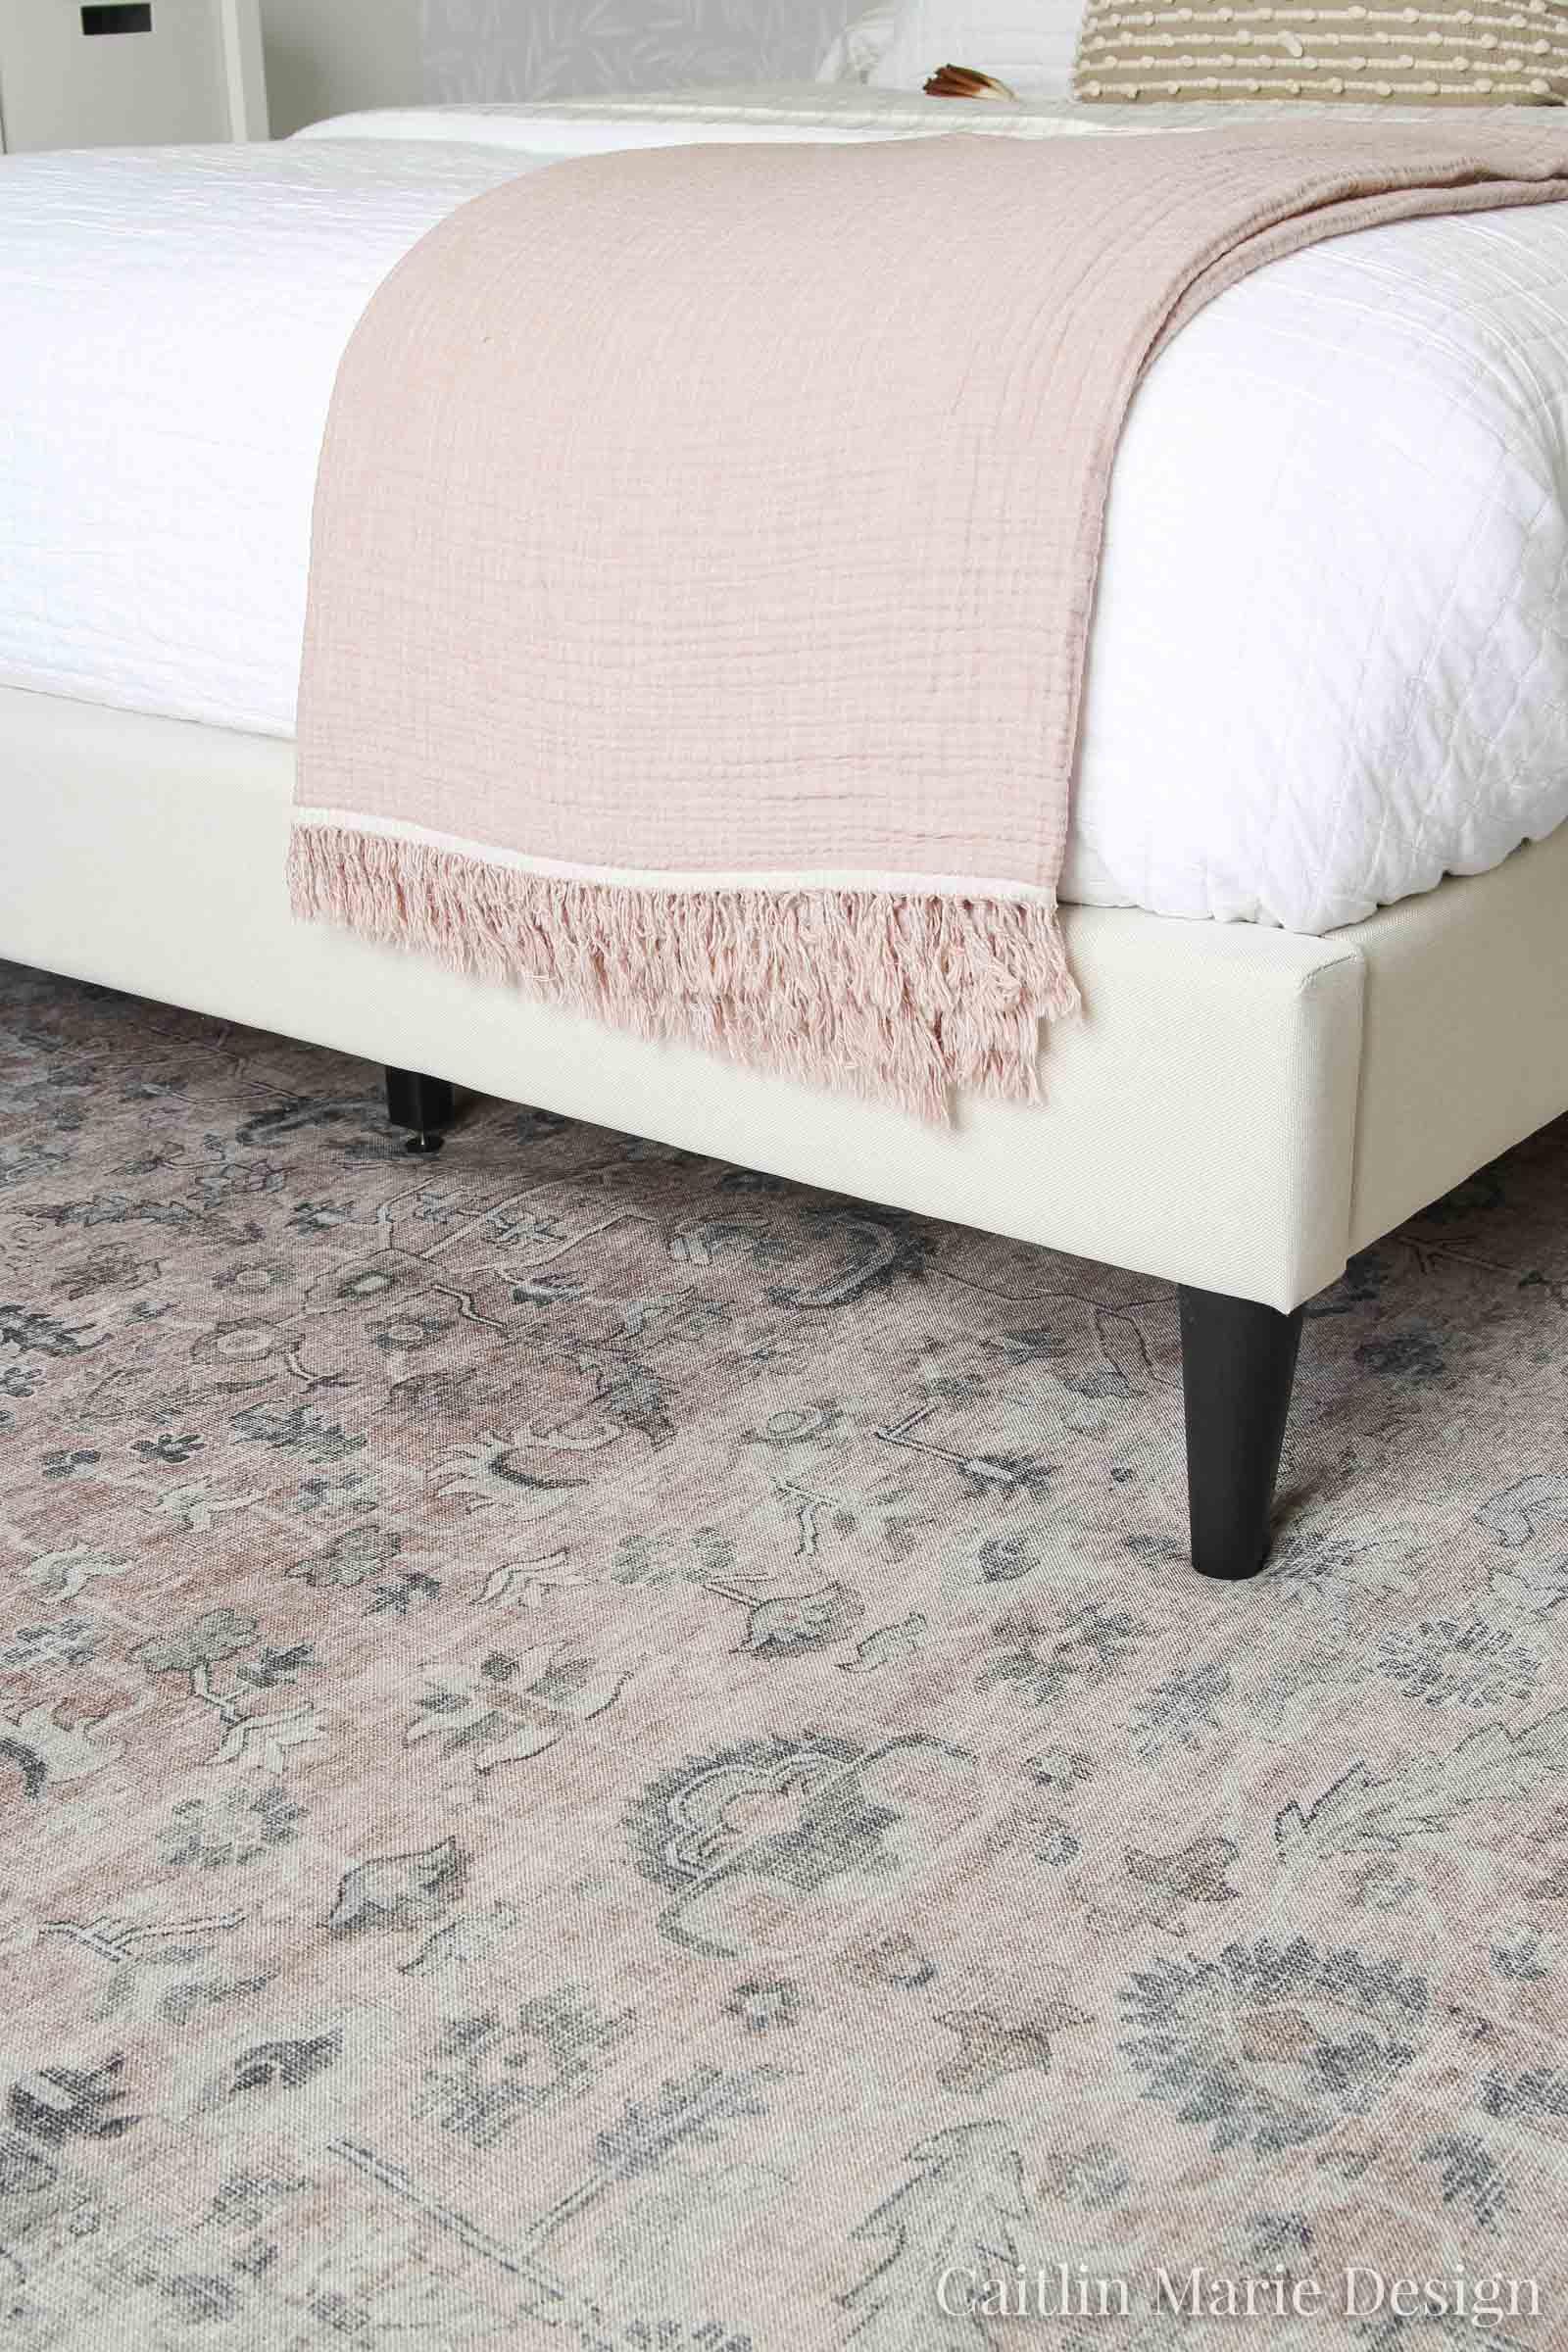 Loloi Hathaway rug HTH-06 Blush / Multi vintage look printed rug